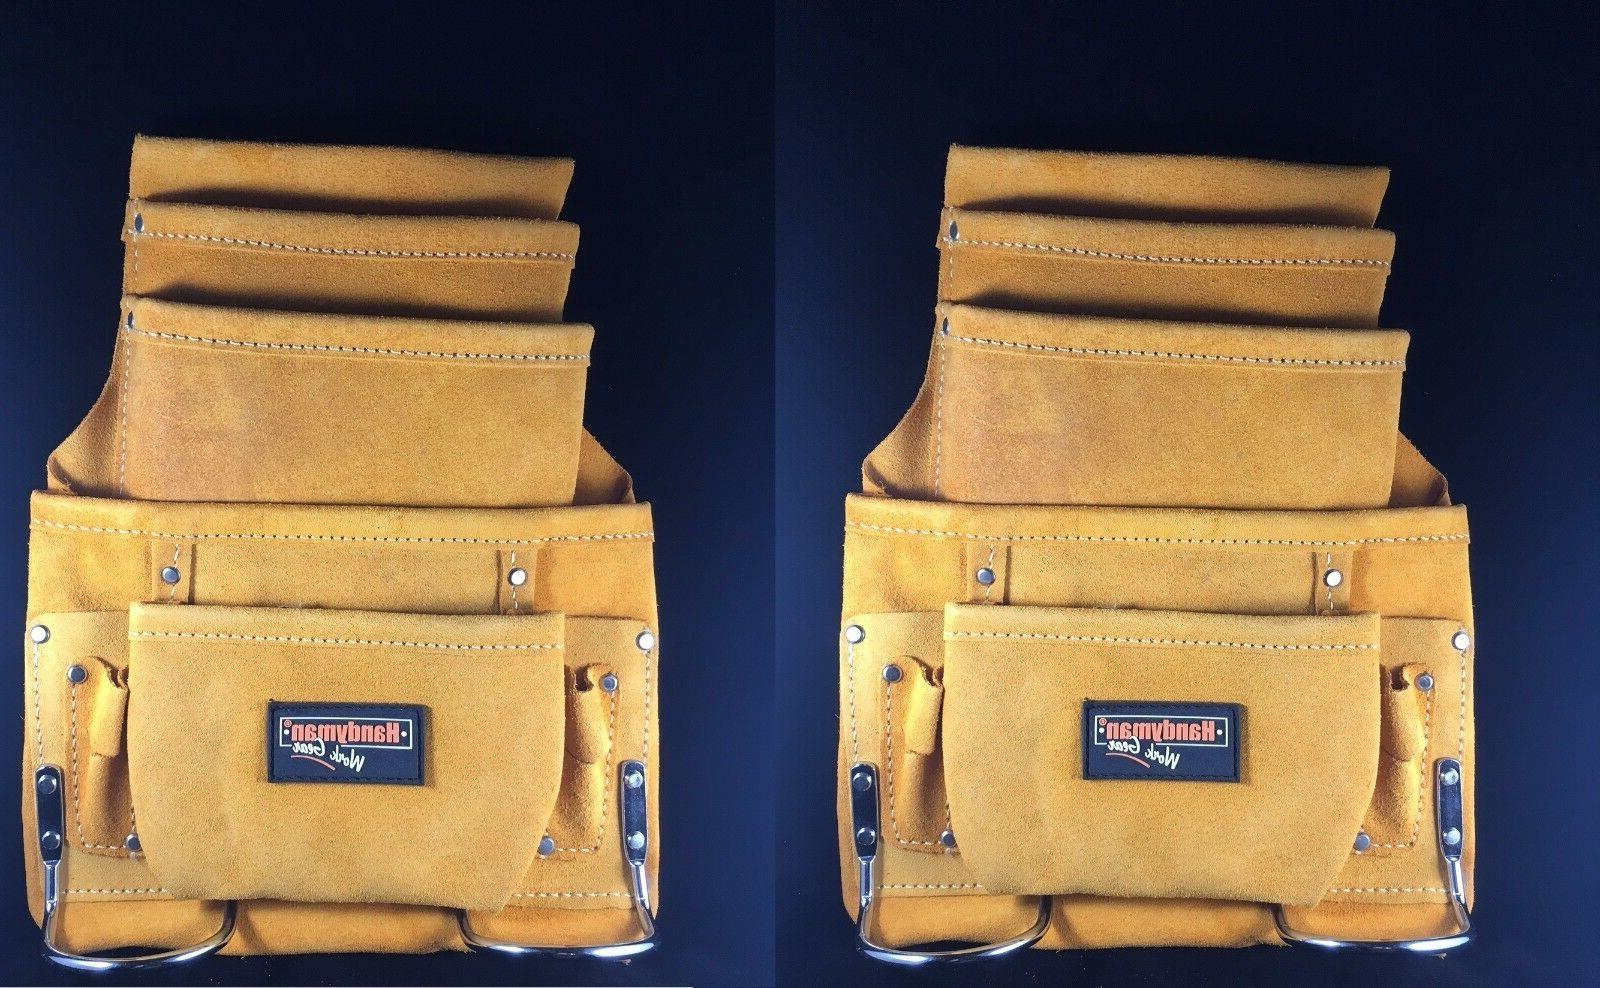 2-PACK !! 10 pocket carpenter electrician nail & tool bag be